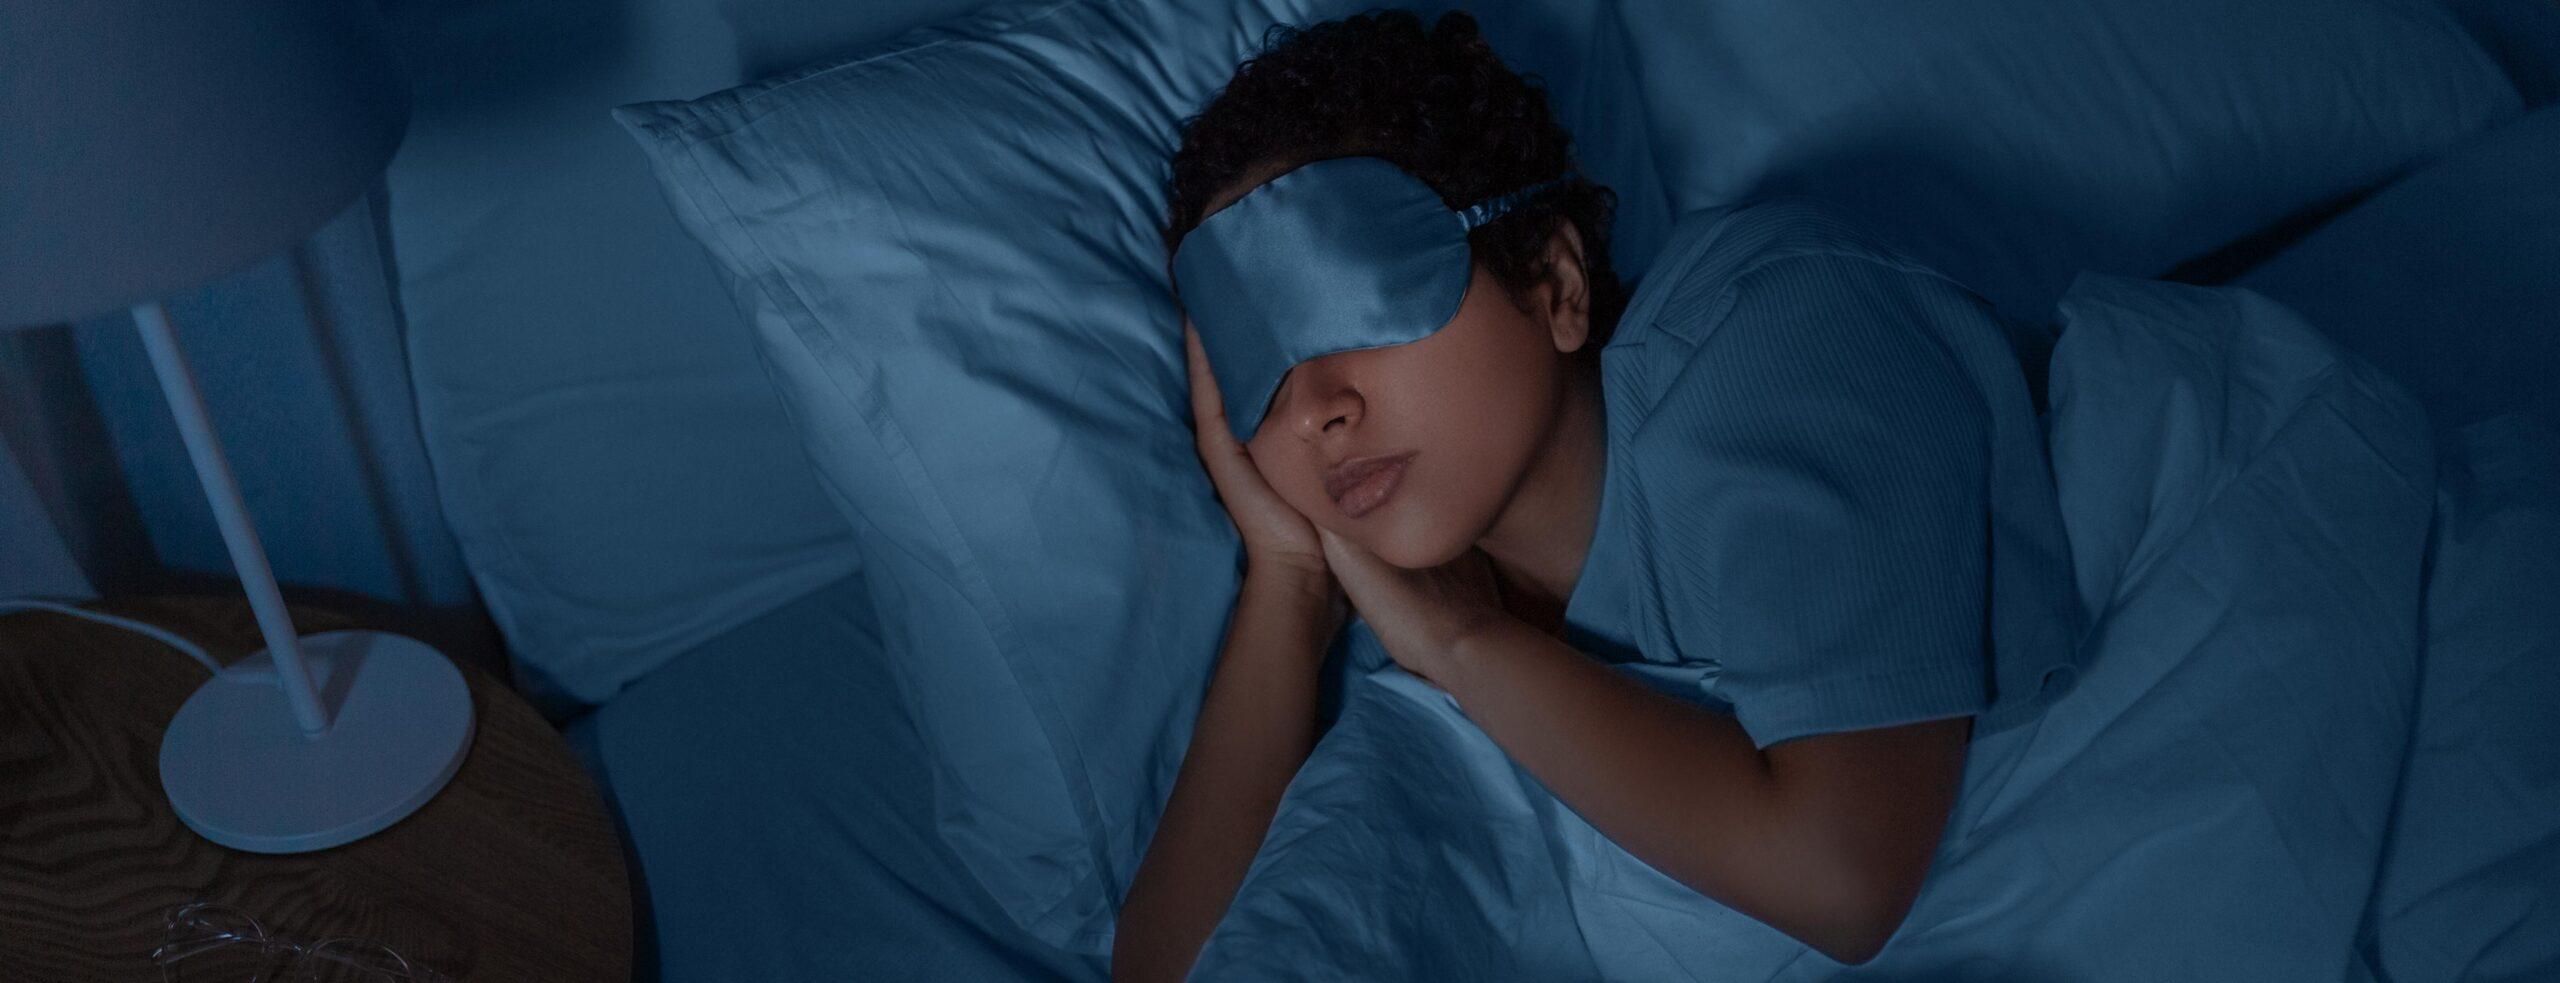 How Much Do You Need To Sleep?